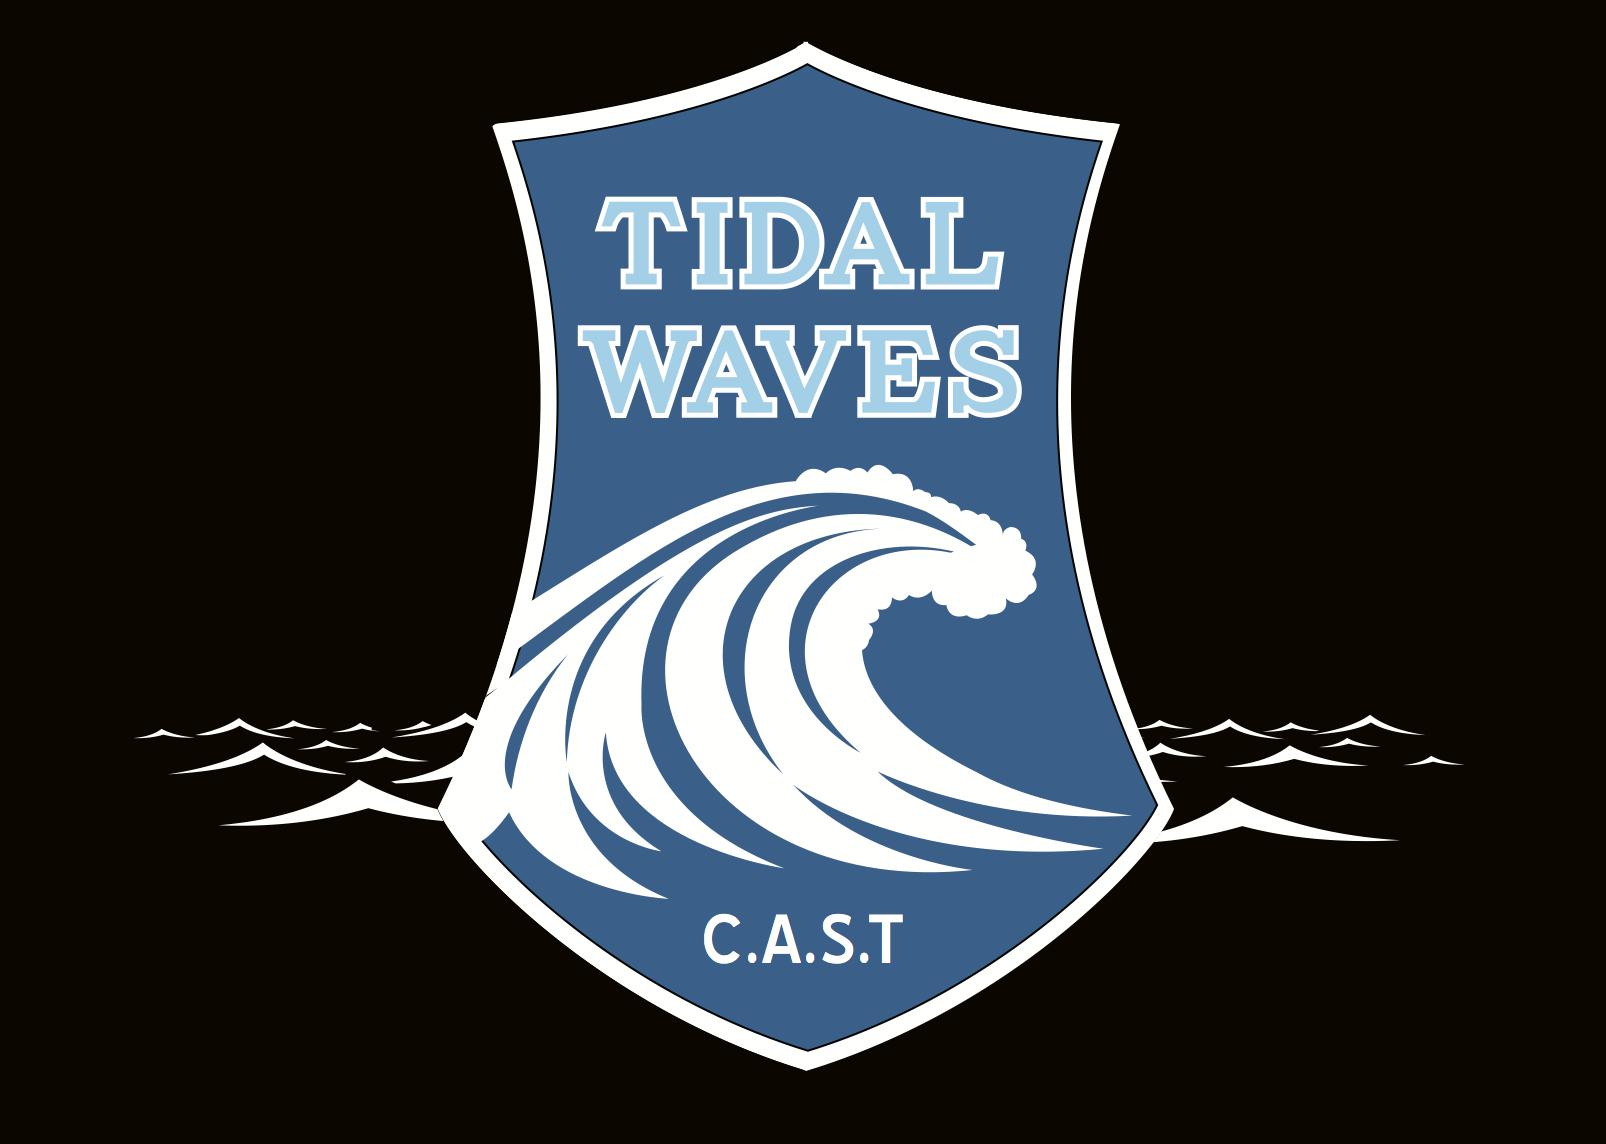 CAST Tidal Waves Logo